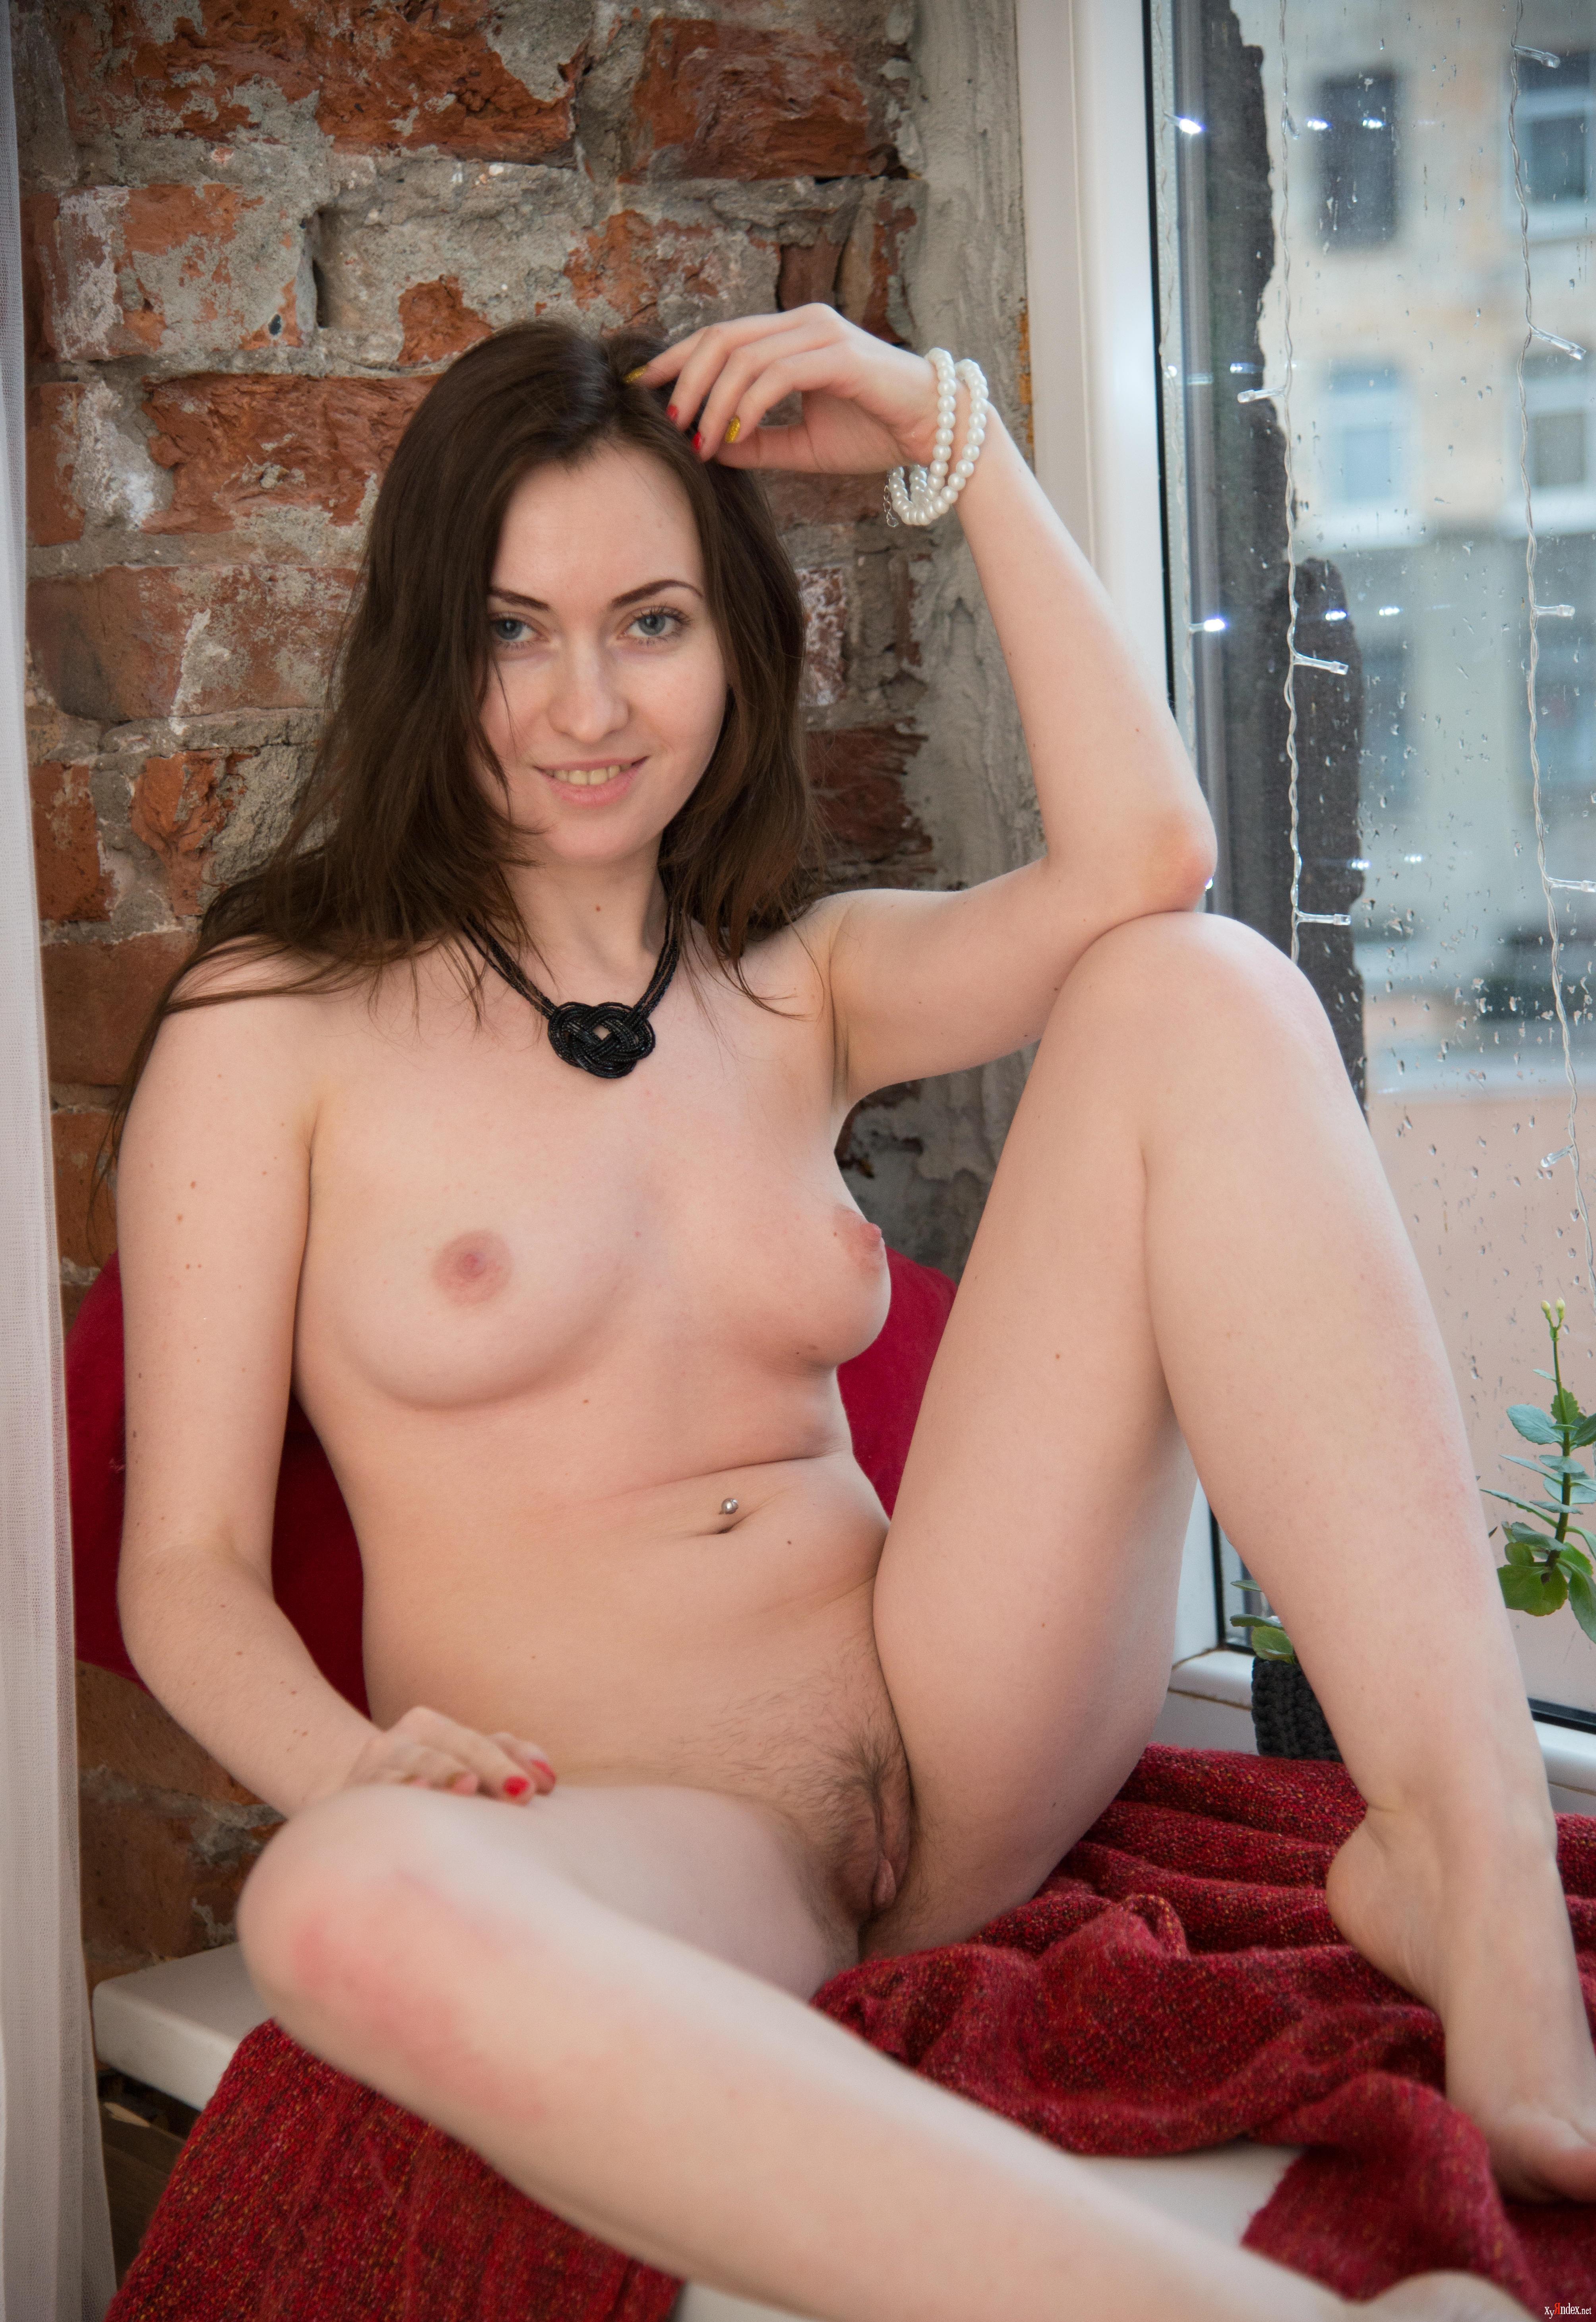 Angela Domai